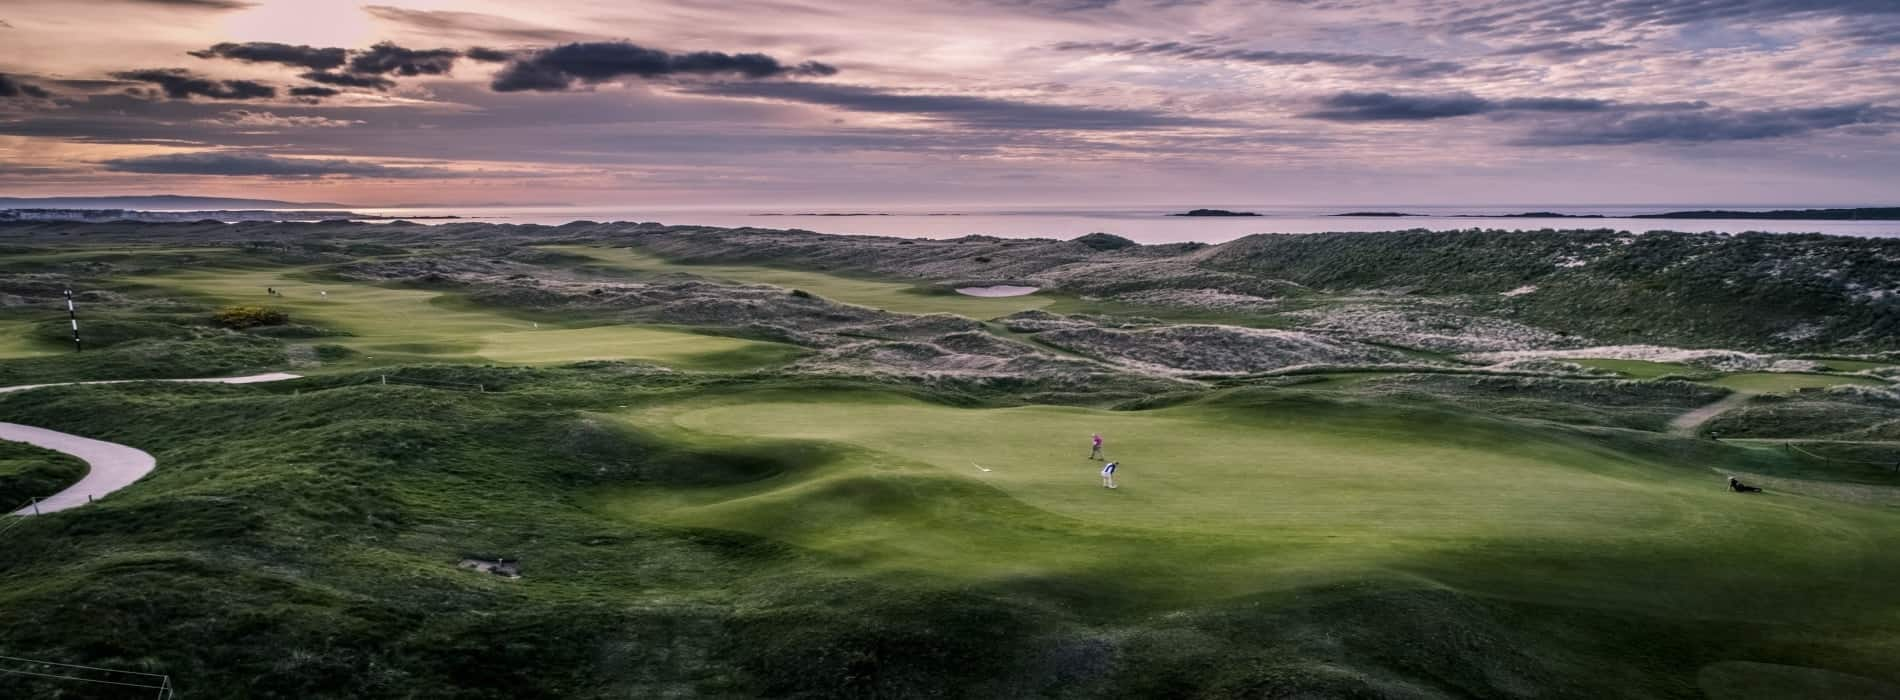 Portrush Golf Club